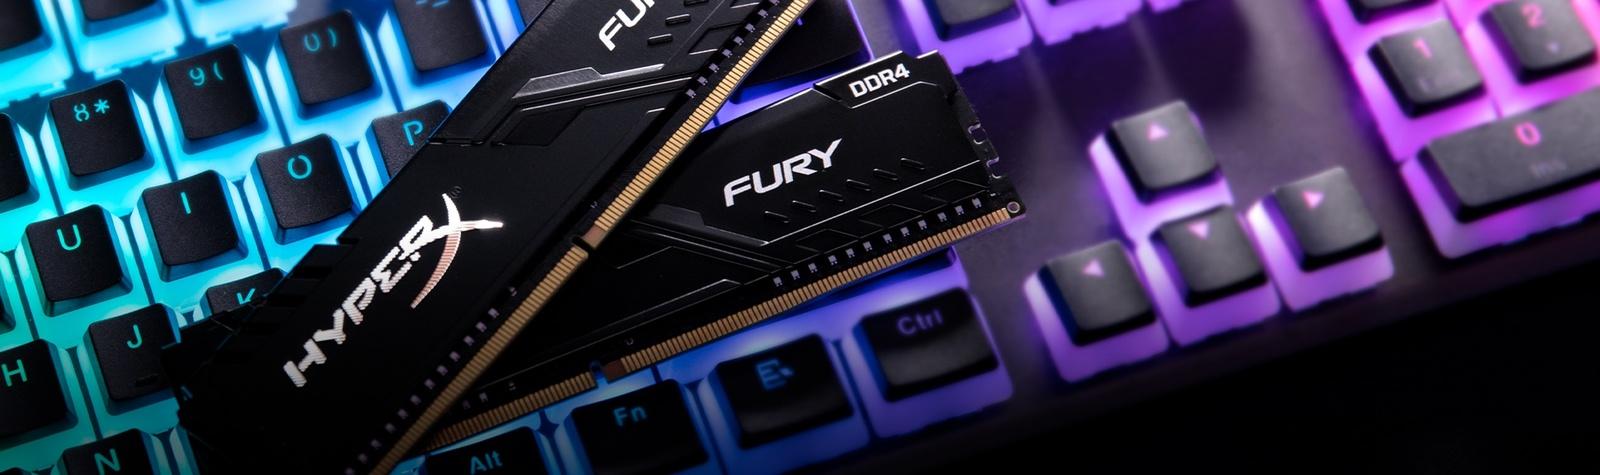 2x8GB Kingston HyperX Fury DDR4 2666MHz Gaming RAM image